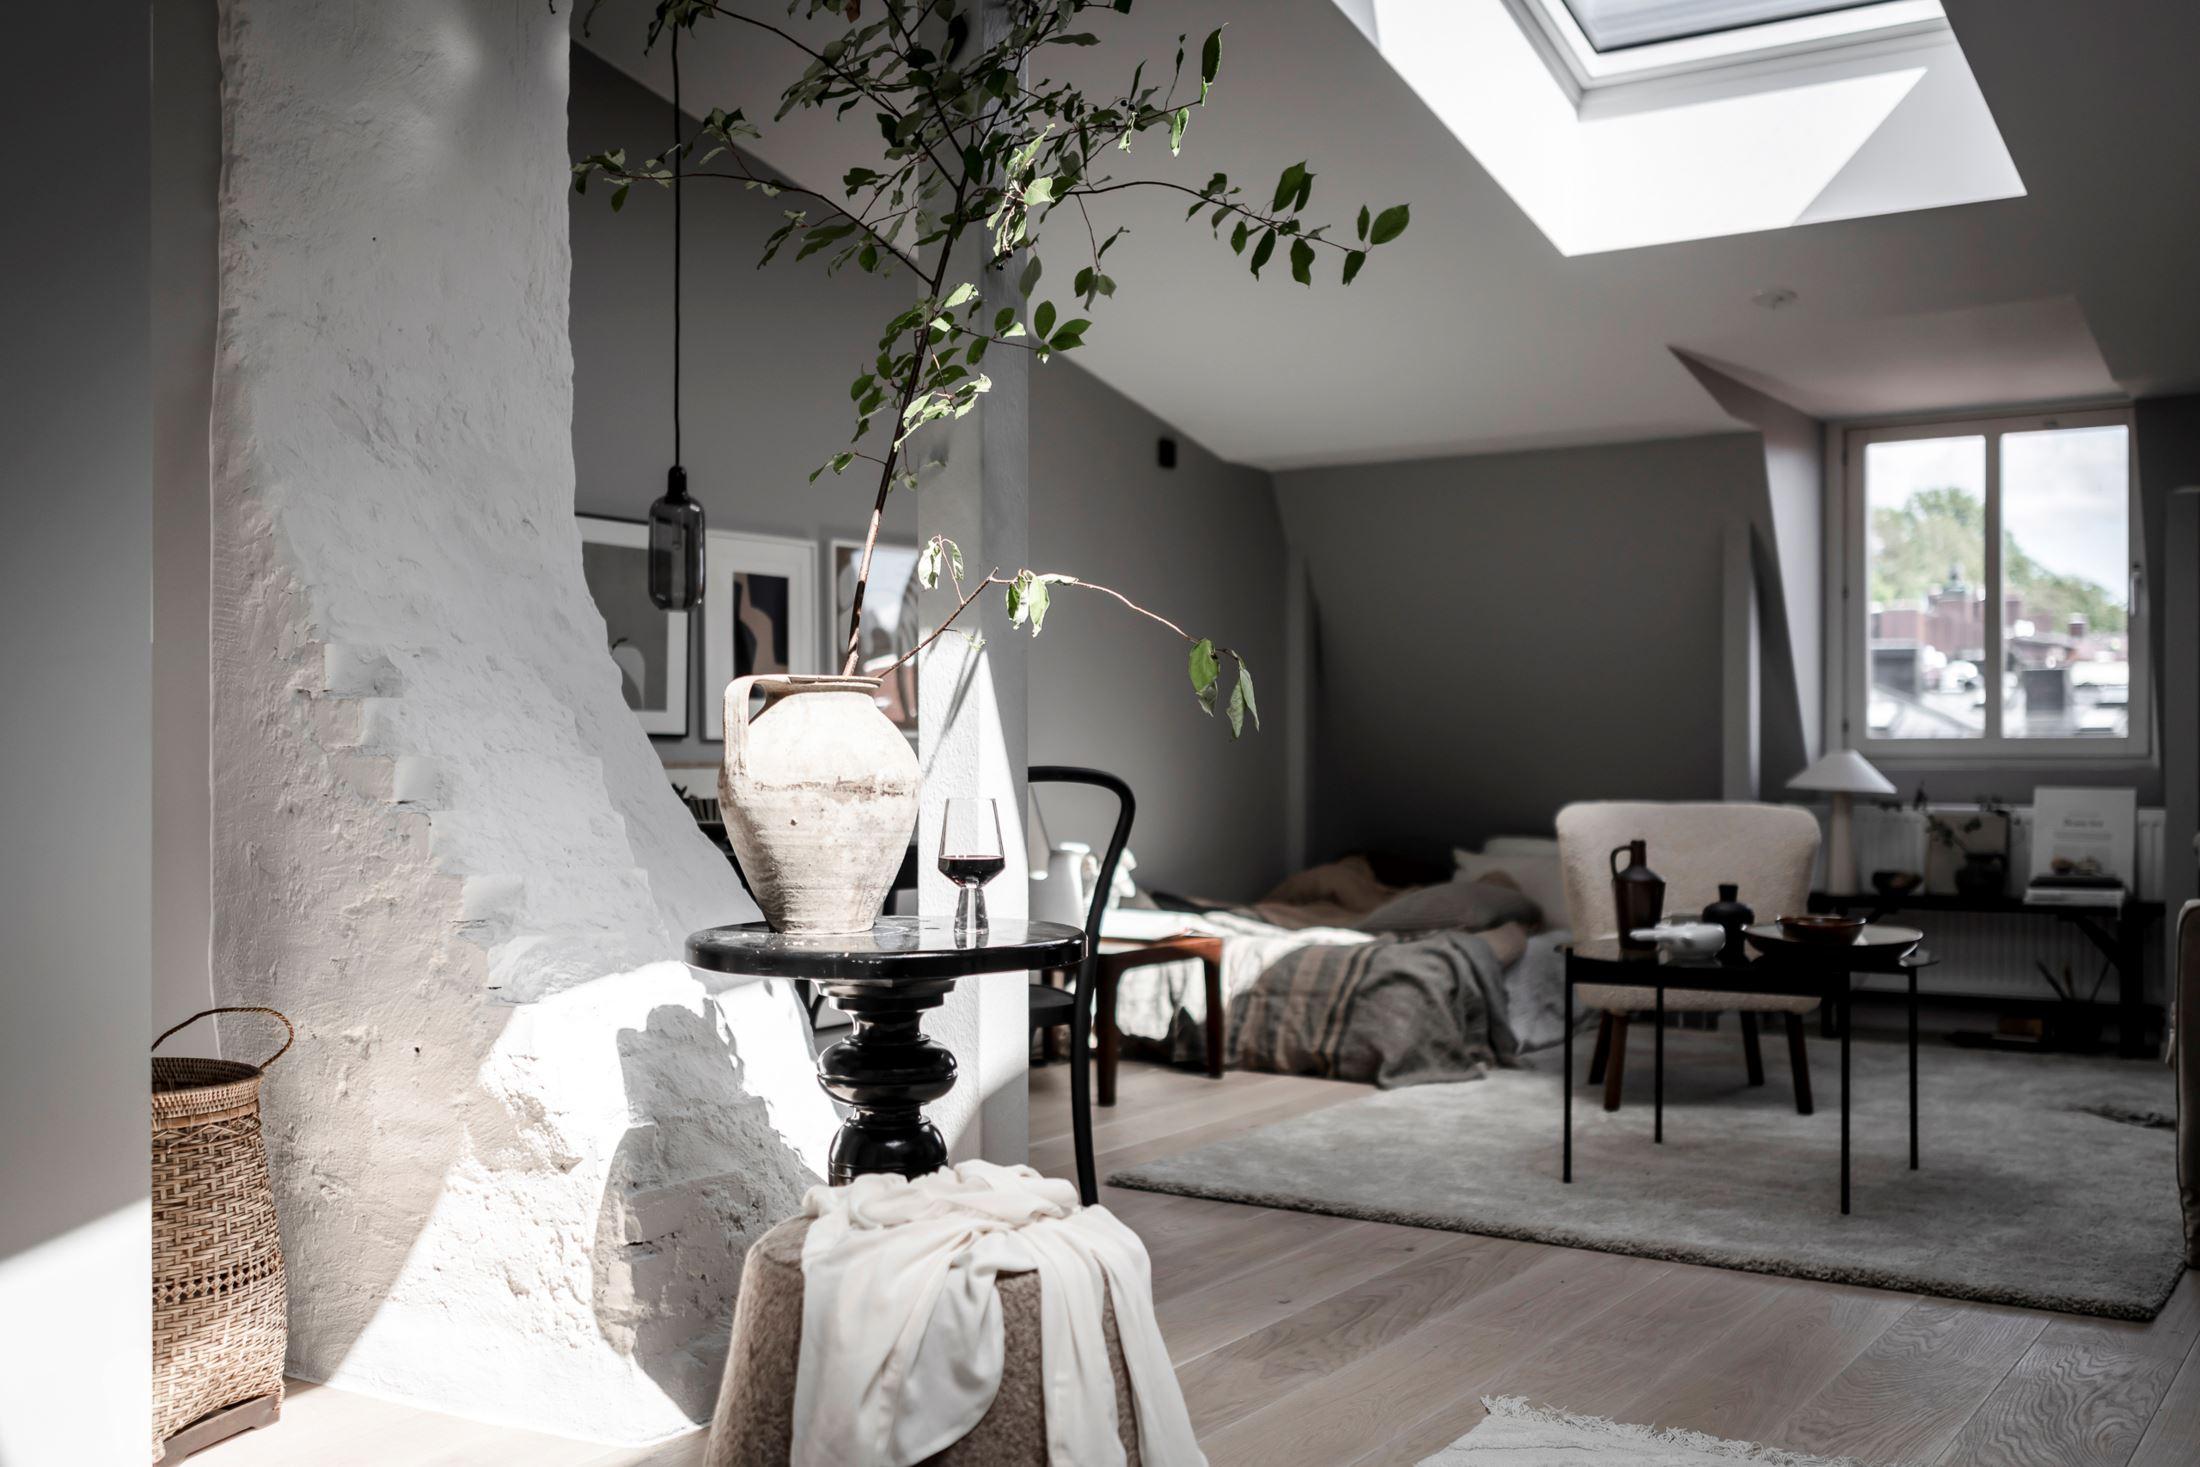 Plan deschis și decor nordic într o garsonieră la mansardă 35 m² 14